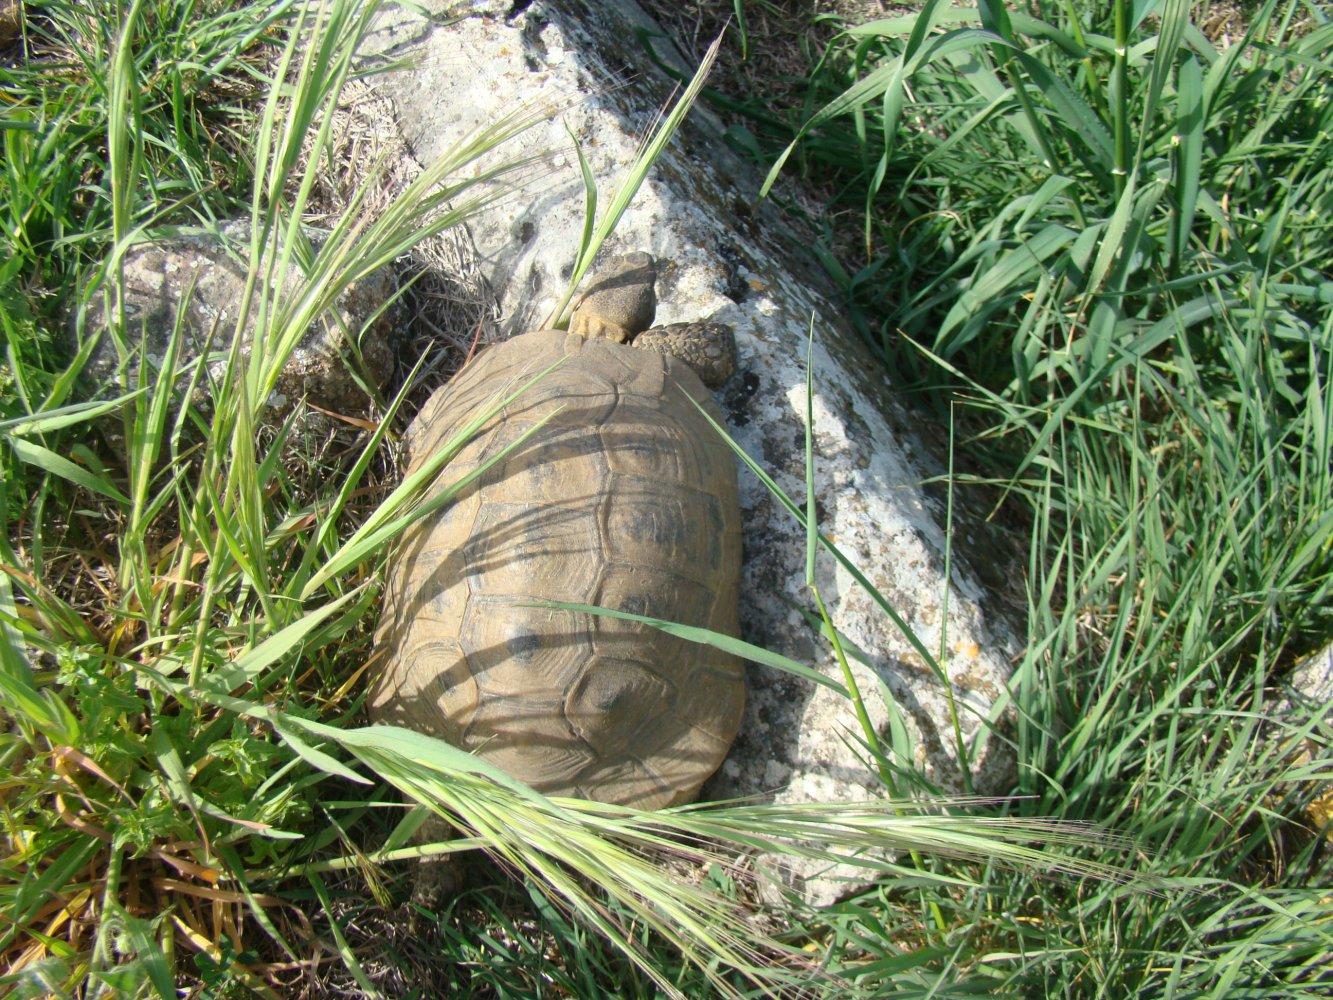 Нашли большую черепаху